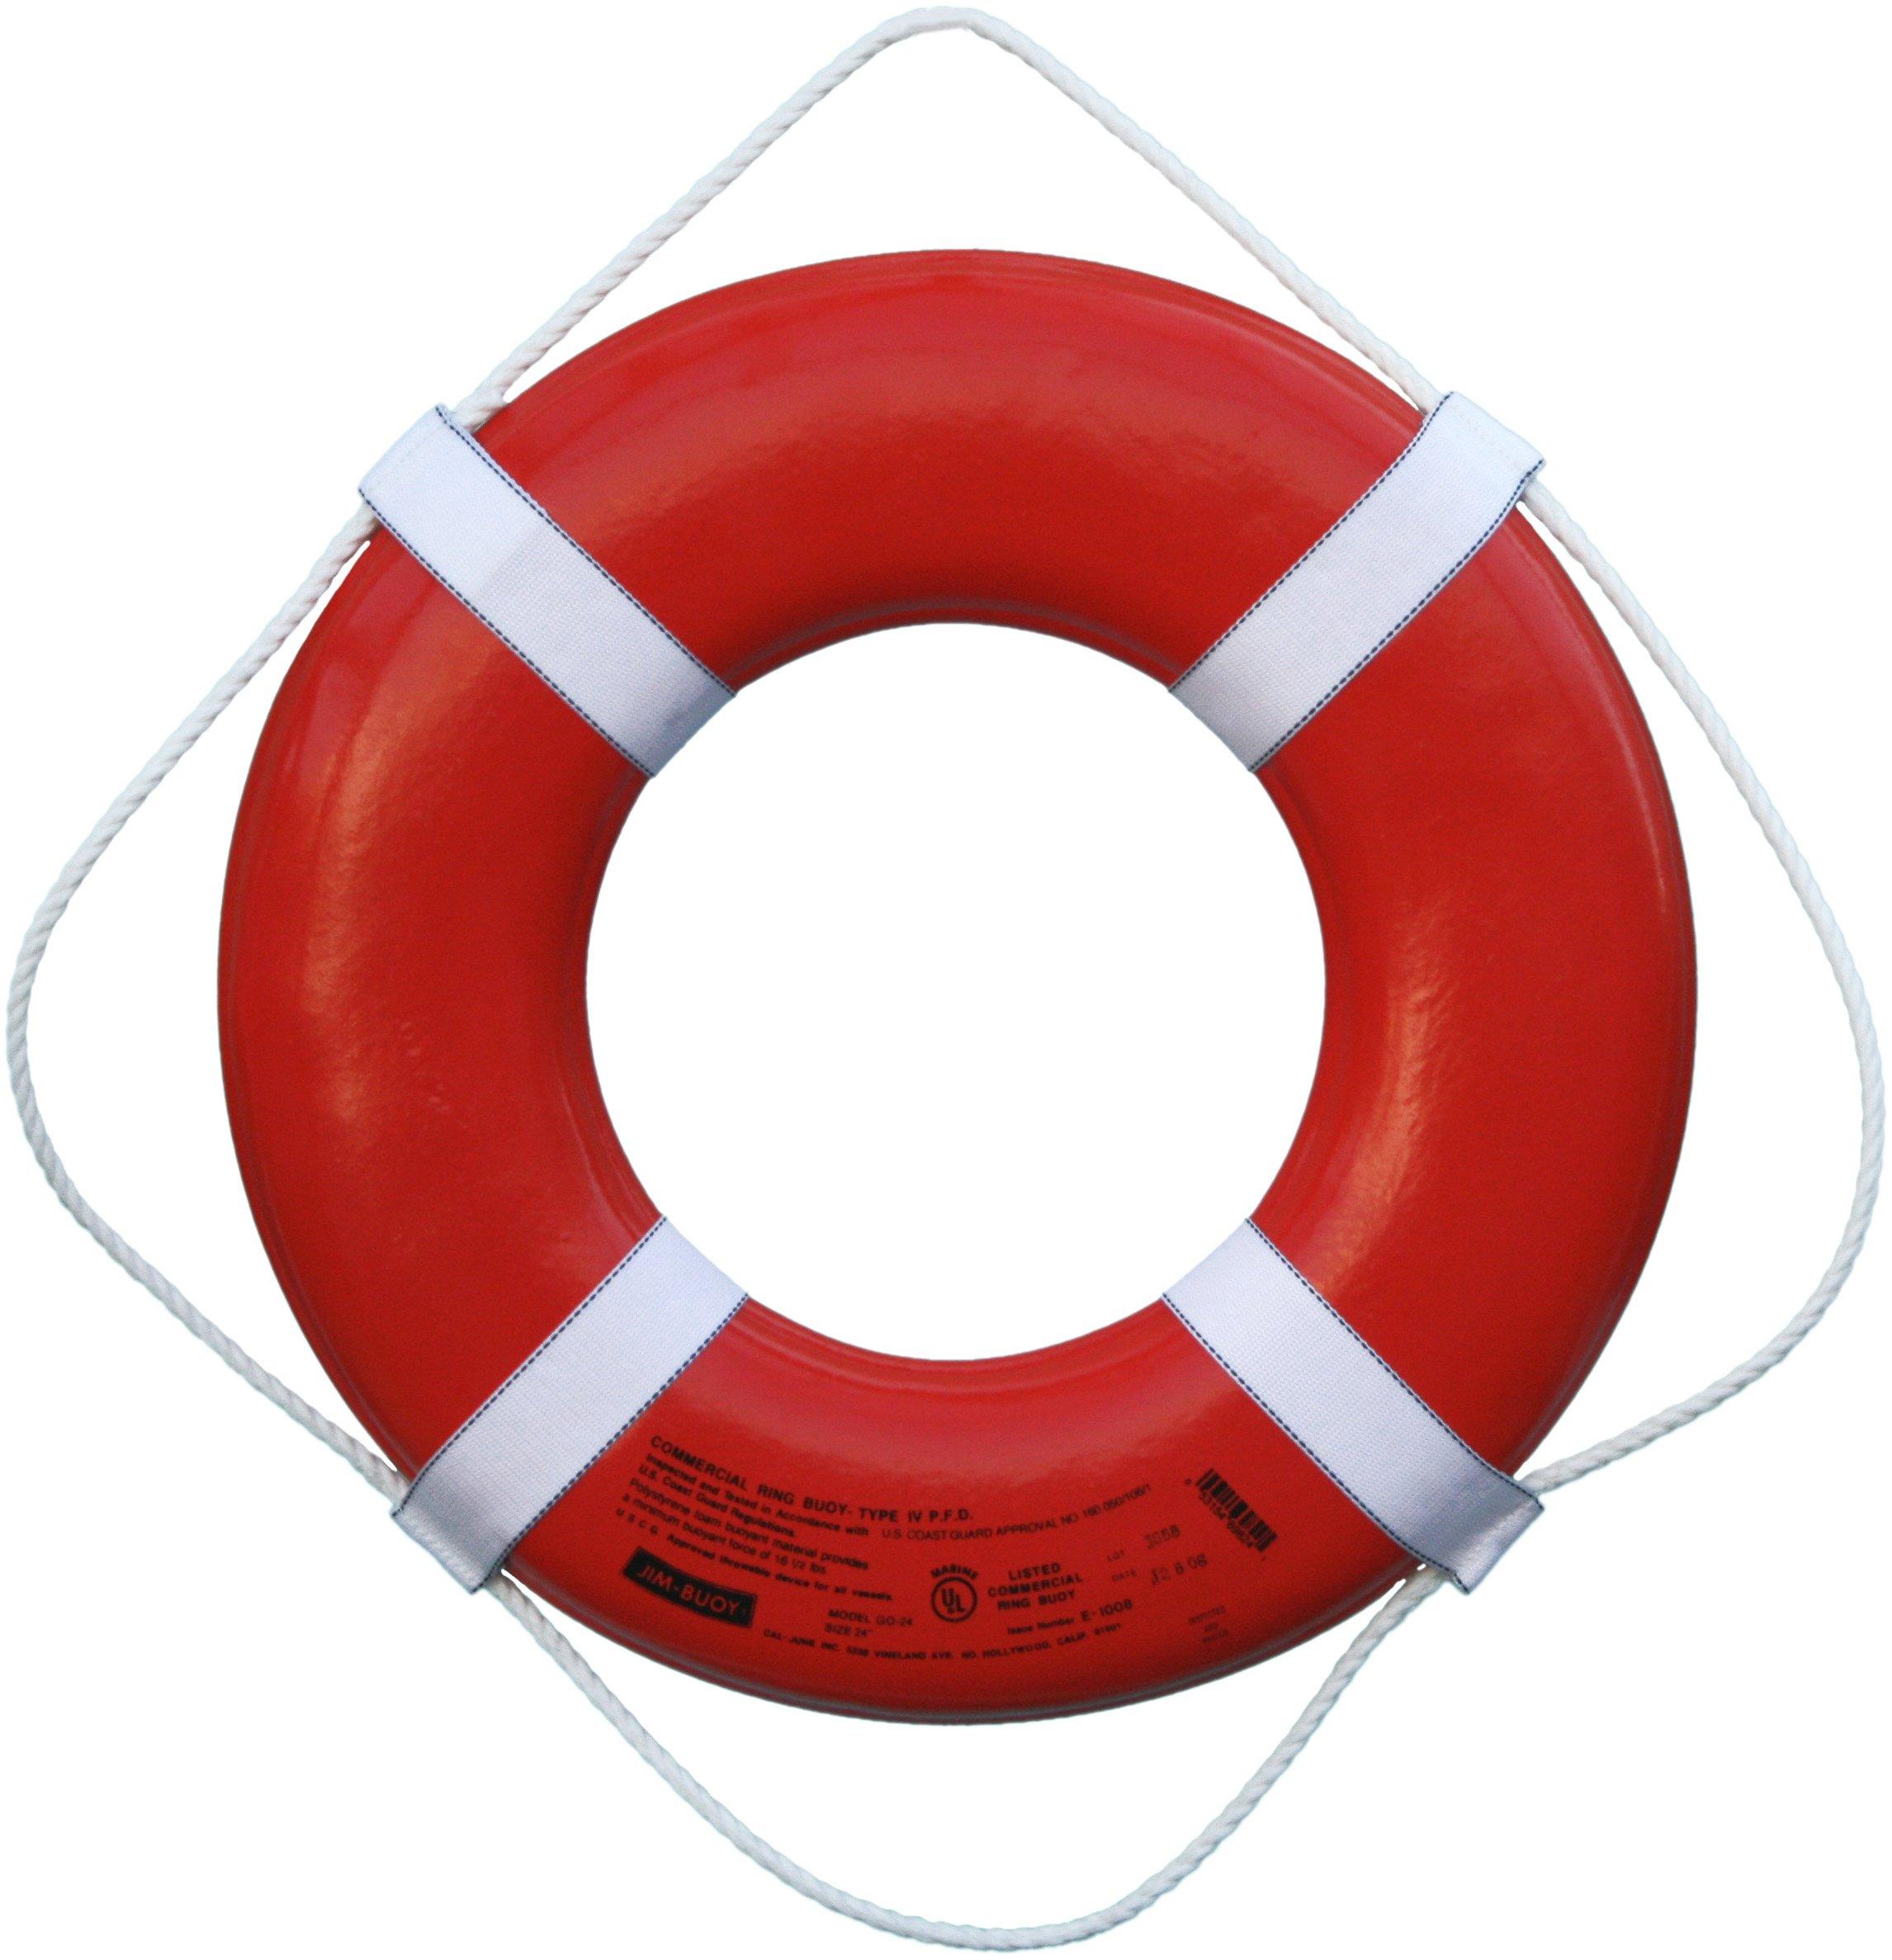 Cal June USCG Approved Ring Buoy (24- Inch Diameter, Orange)